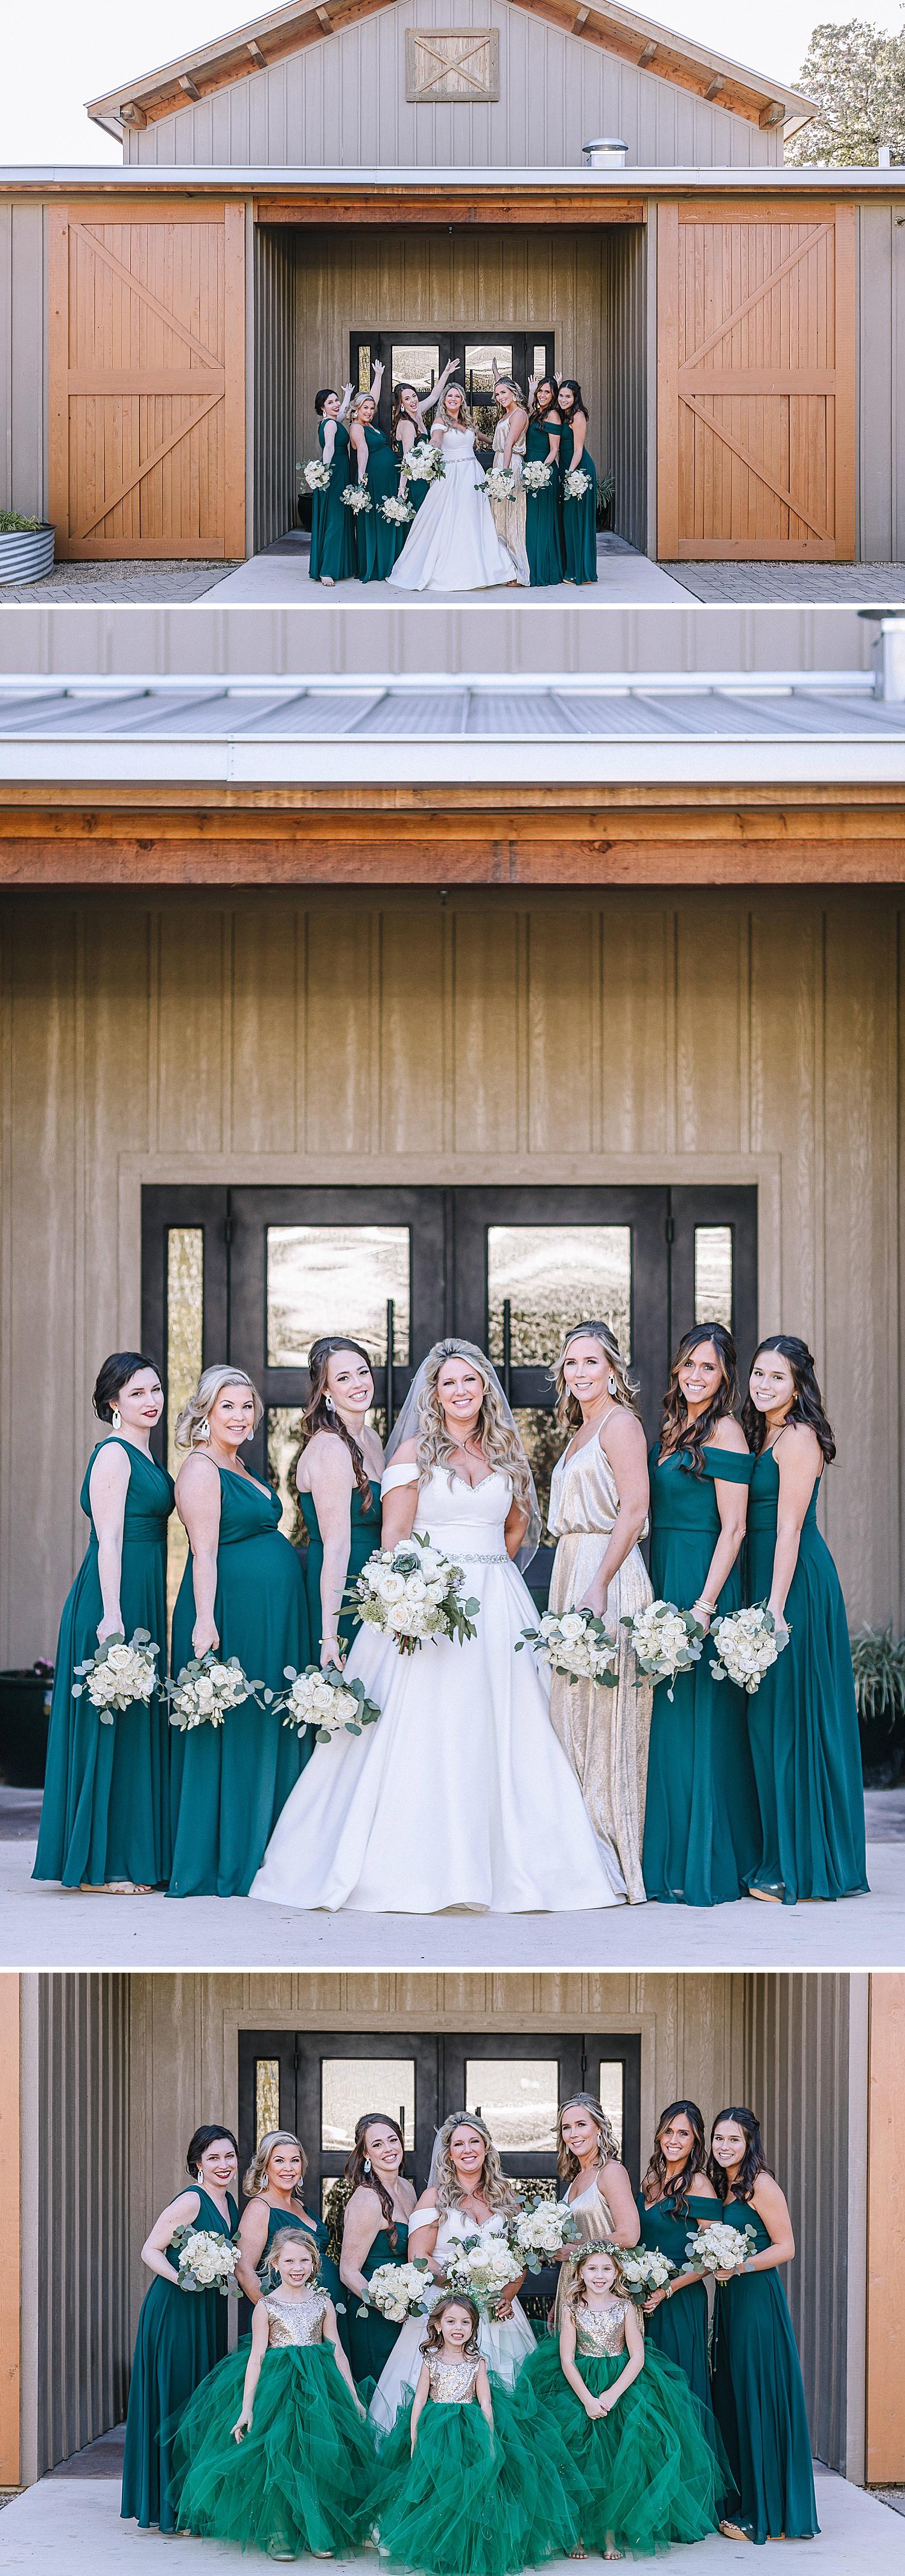 Magnolia-Halle-Wedding-San-Antonio-Texas-Bride-Grom_0044.jpg